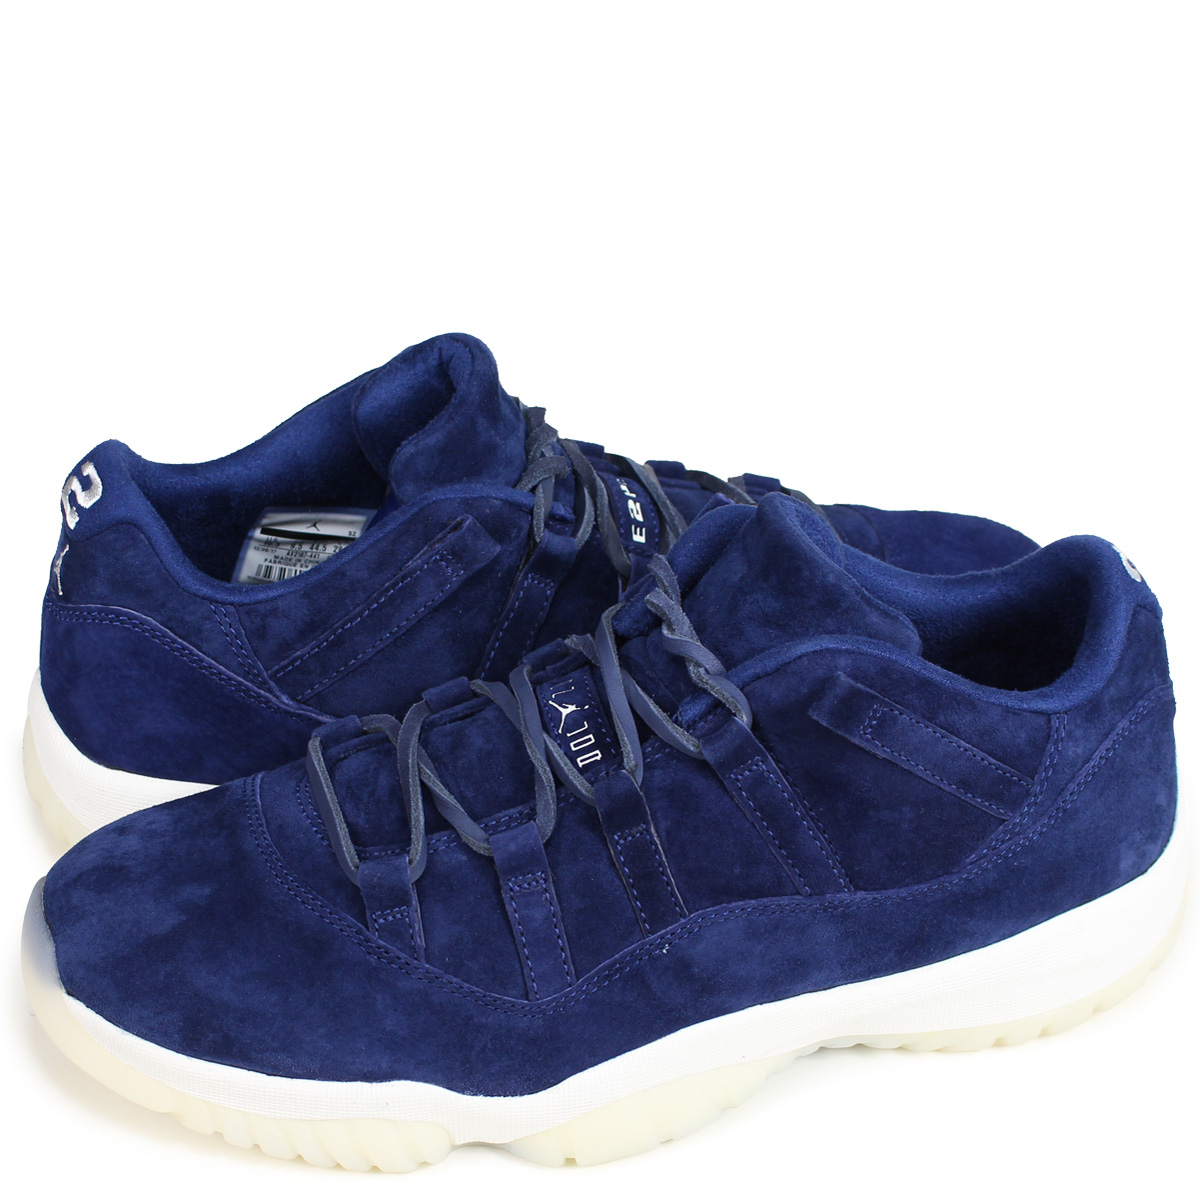 a00e5d1f194353 NIKE AIR JORDAN 11 RETRO LOW RE2PECT Nike Air Jordan 11 nostalgic sneakers  men AV2187-441 blue  1810